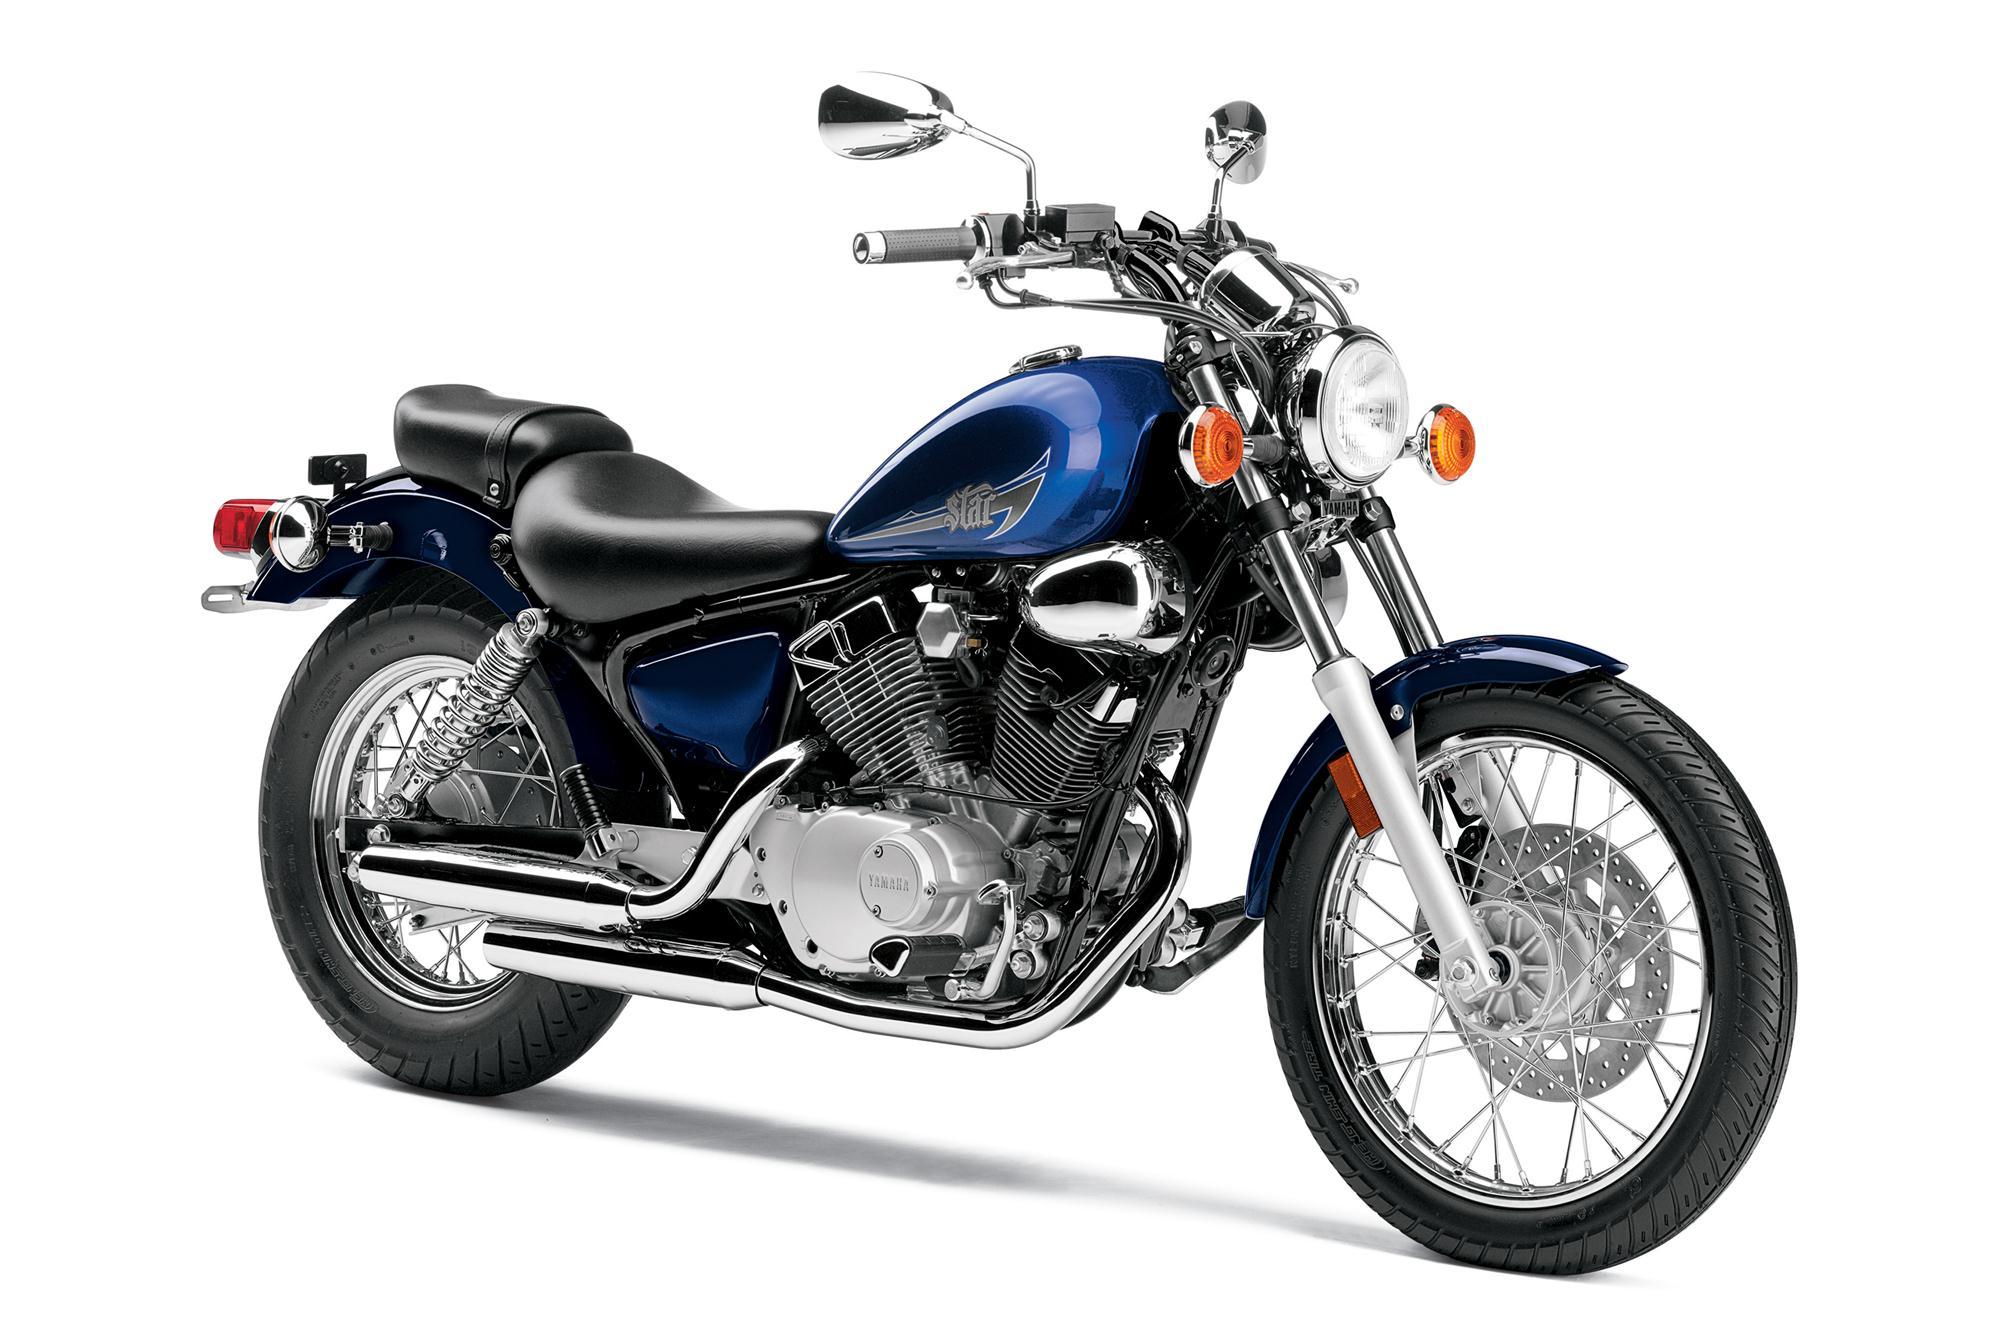 Yamaha Virago Xv Price In India